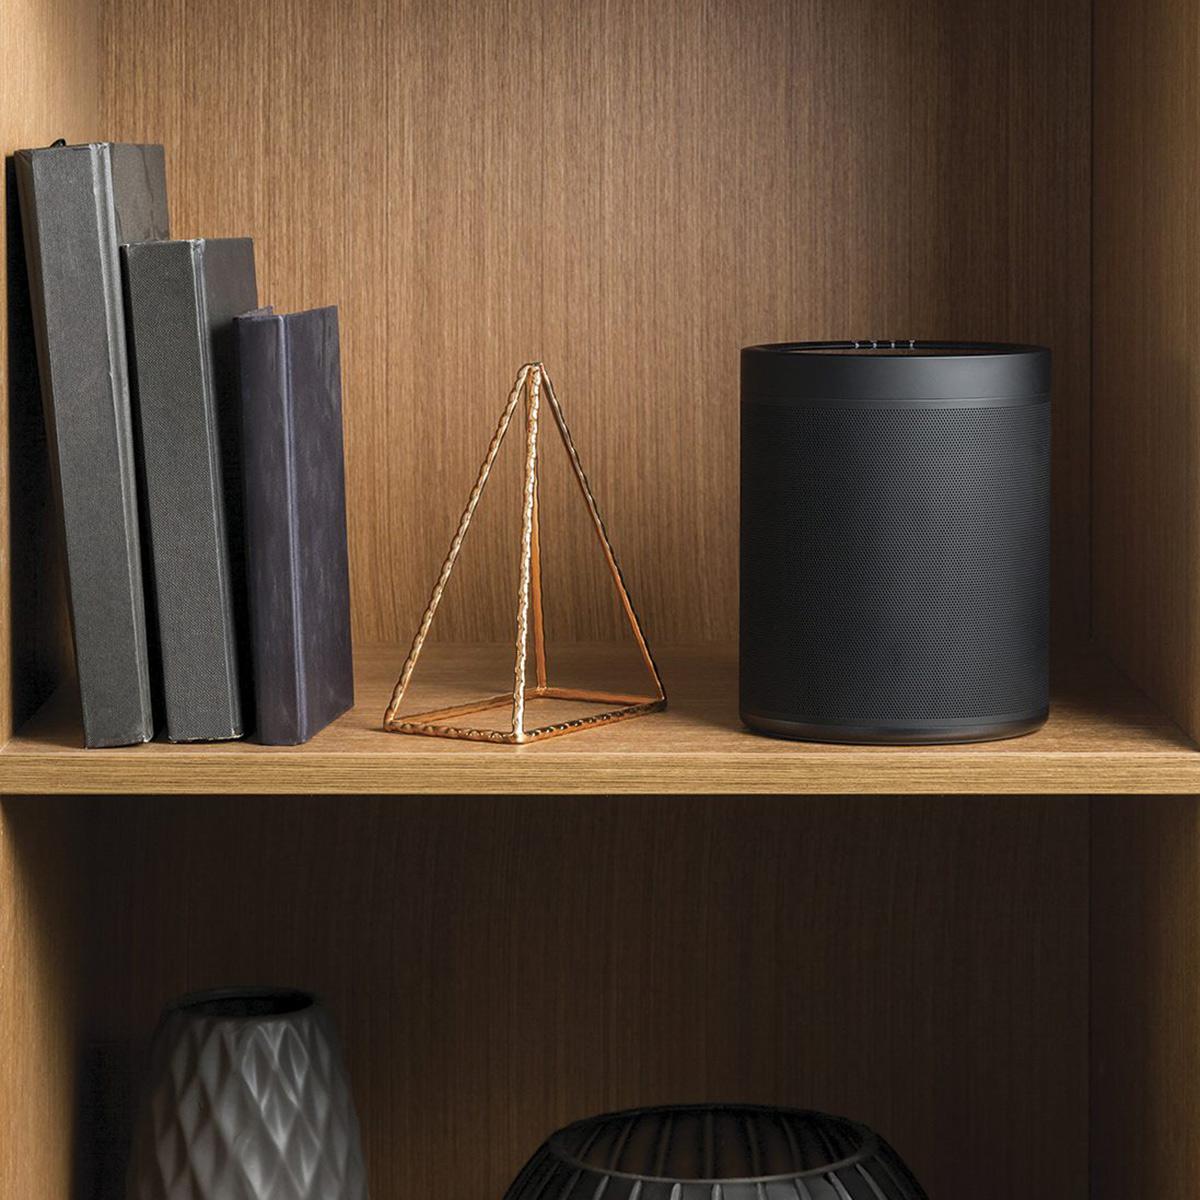 Yamaha-WX-021-MusicCast-20-Wireless-Speaker thumbnail 16